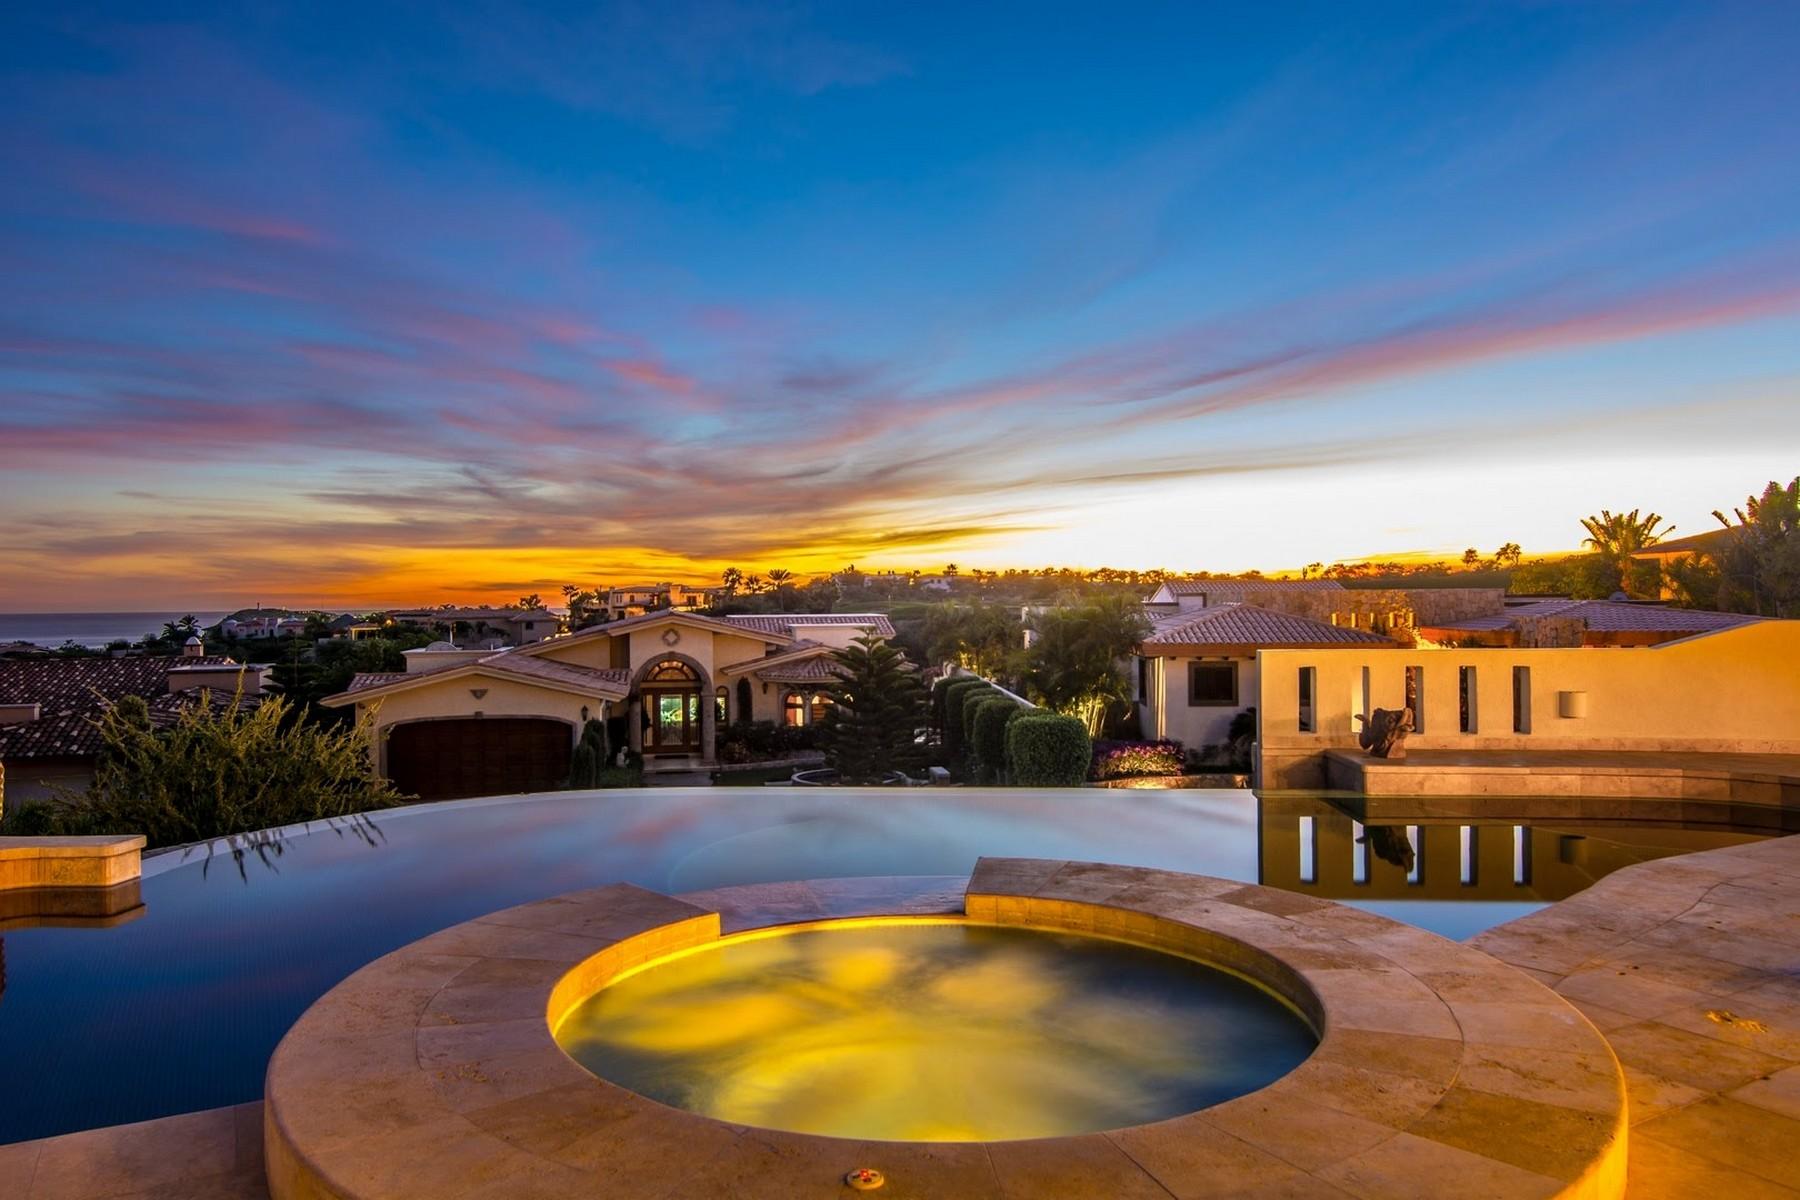 Additional photo for property listing at Villa Del Corazon 4 Las Brisas Cabo San Lucas, Baja California Sur 23455 México